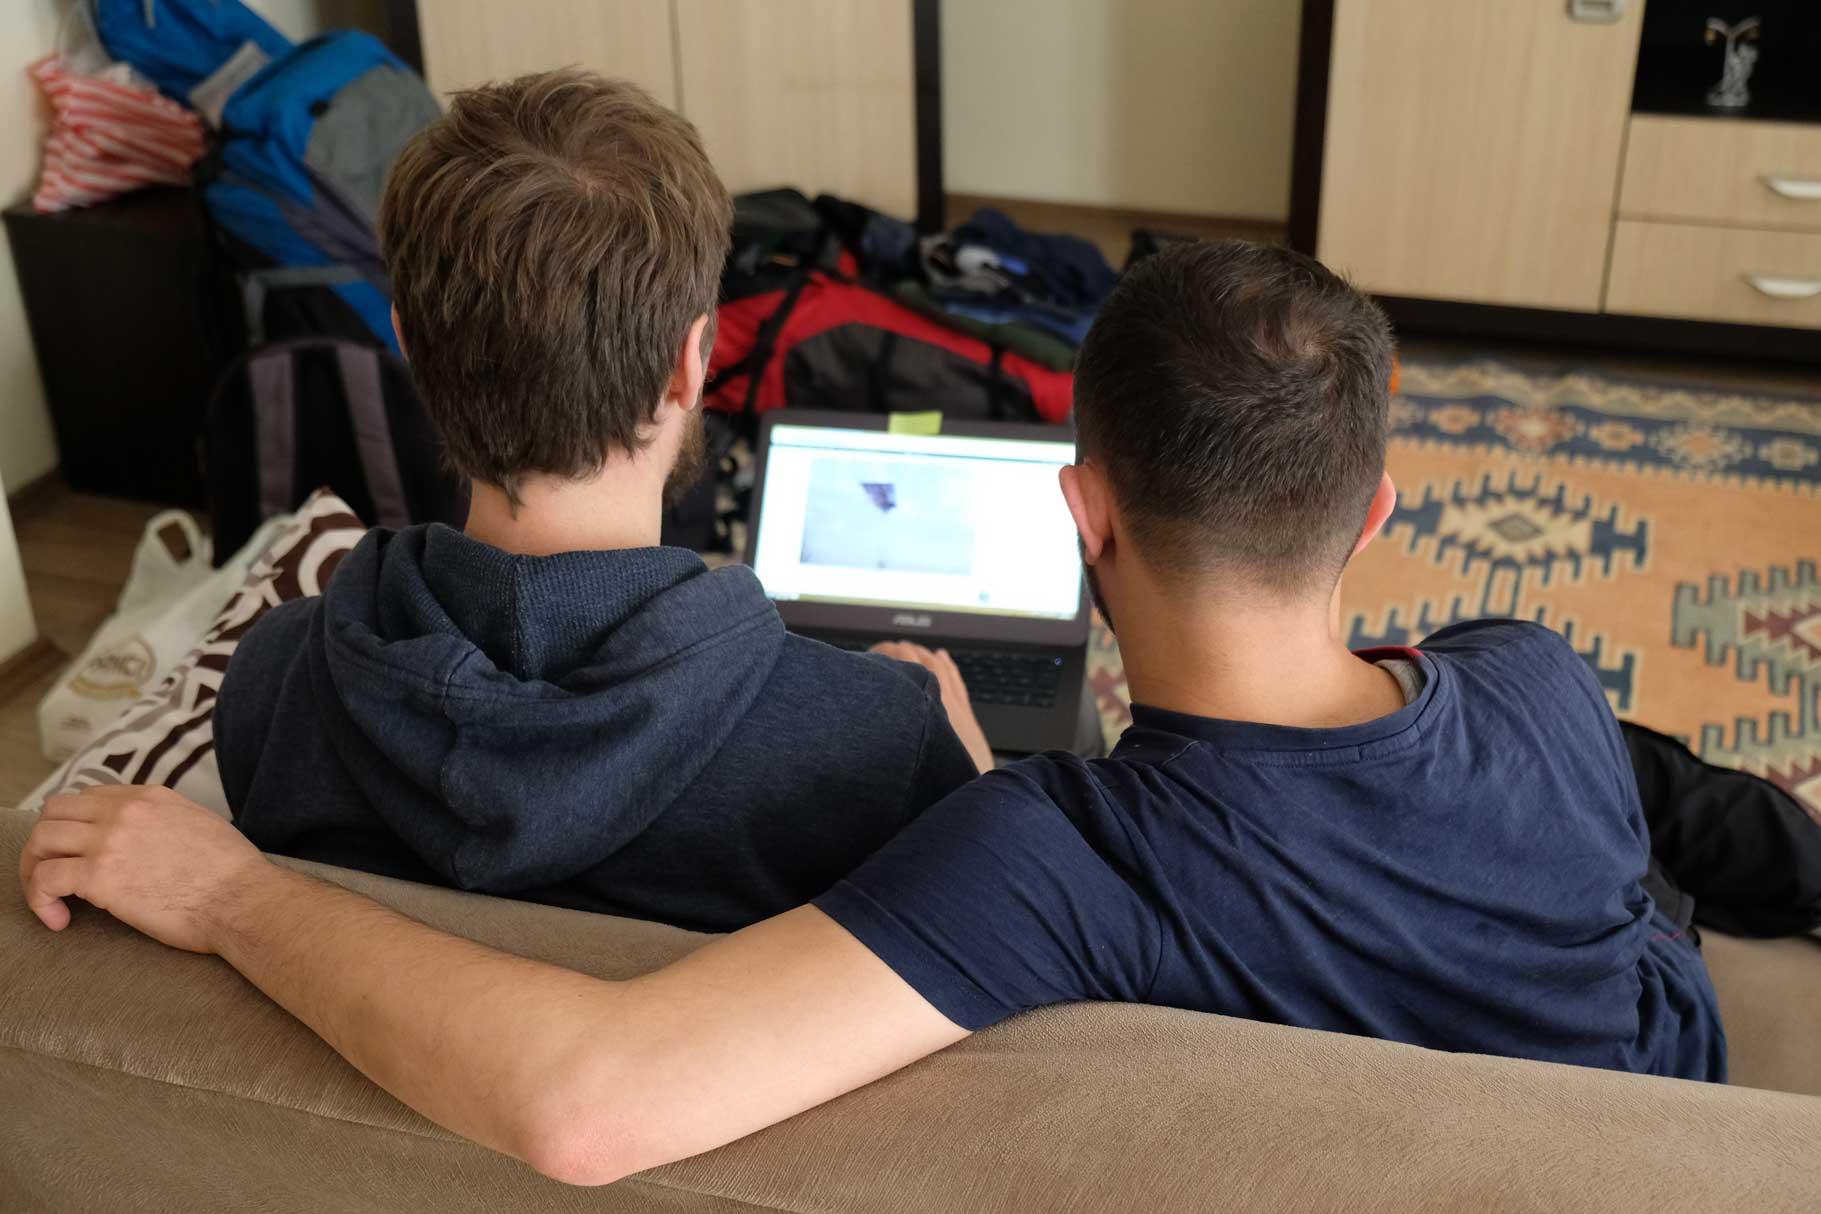 Sebastian und Fatih am Laptop